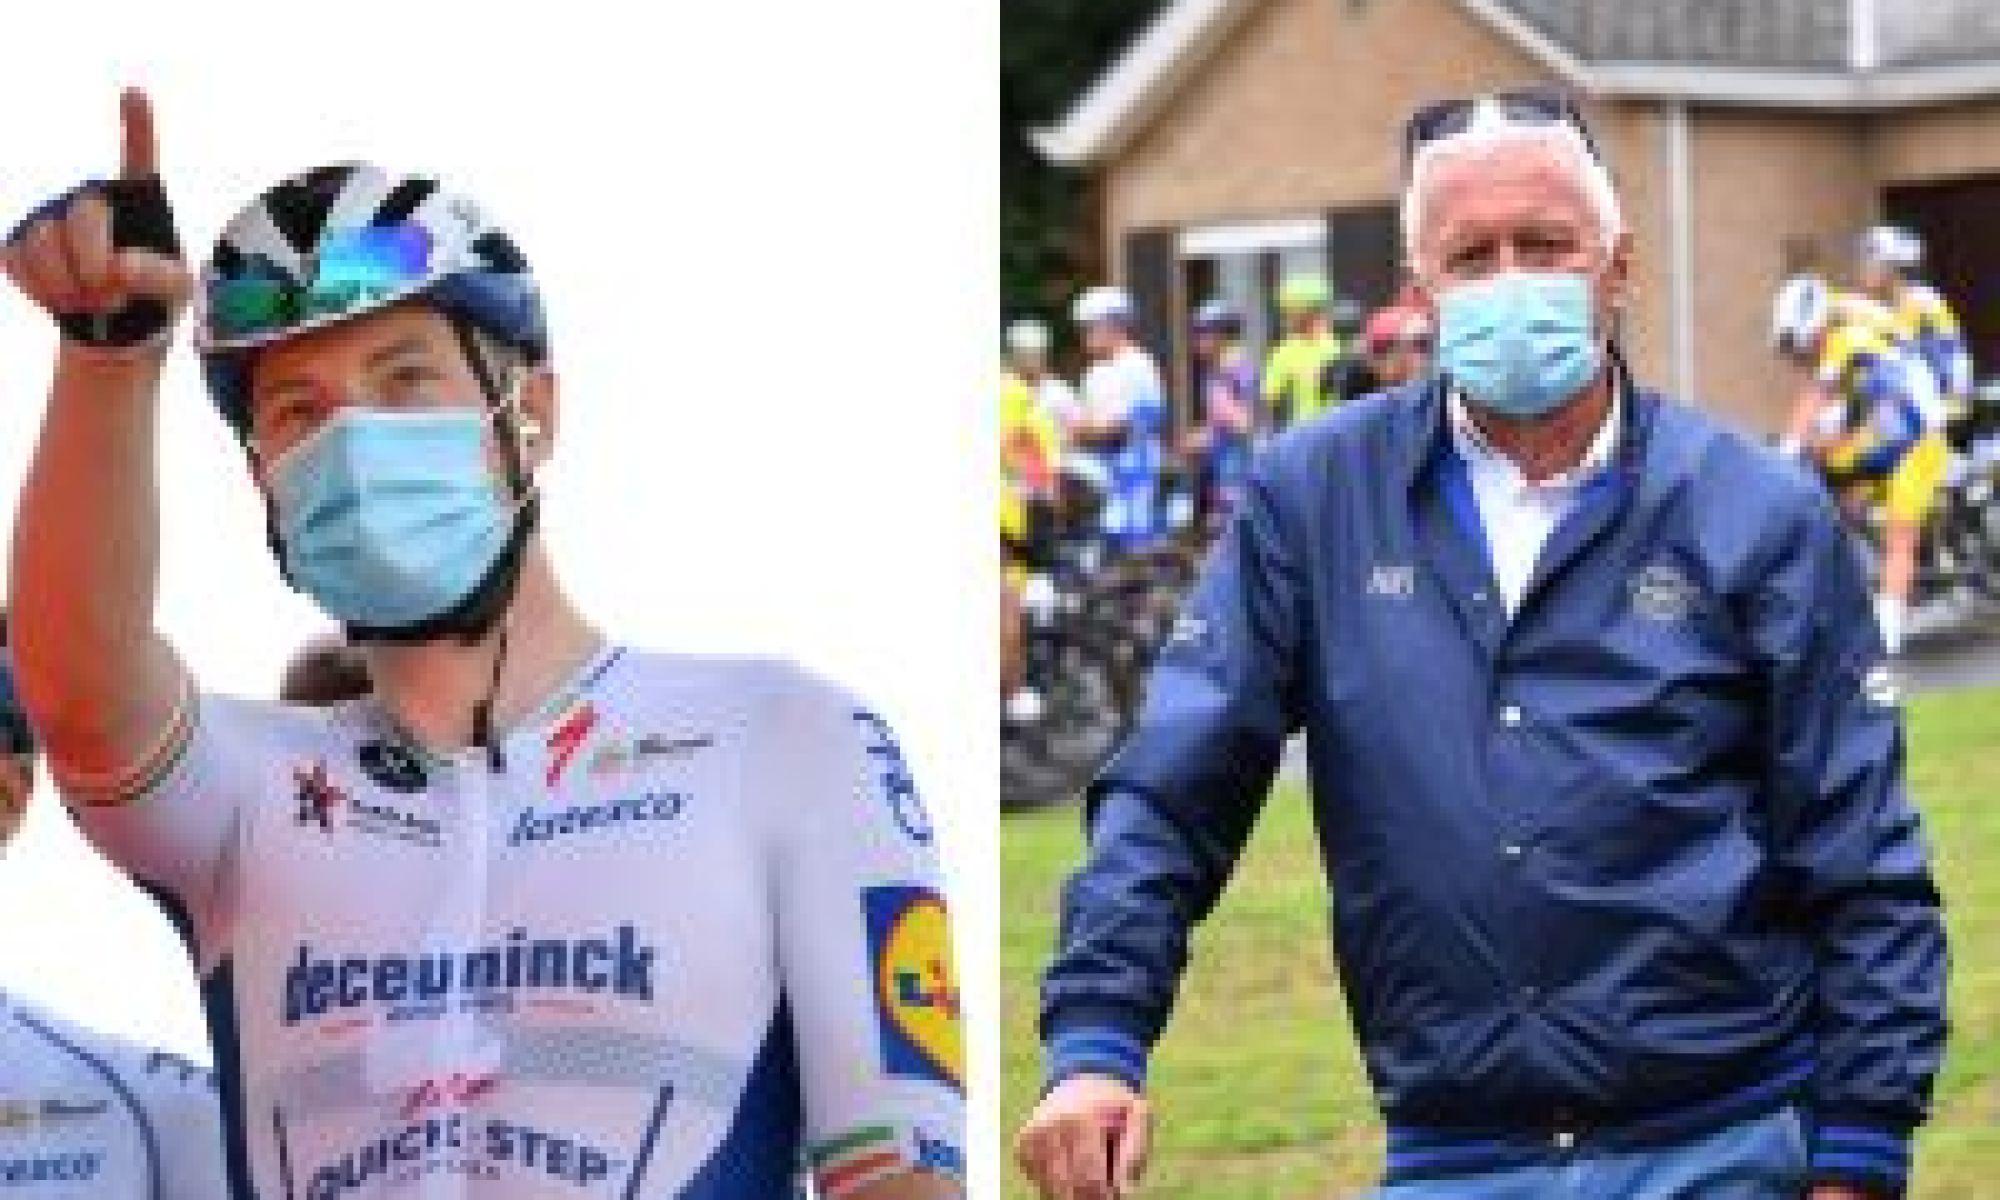 <div>Patrick Lefevere calls Sam Bennett's relegation 'bulls**t' at Vuelta a España</div>